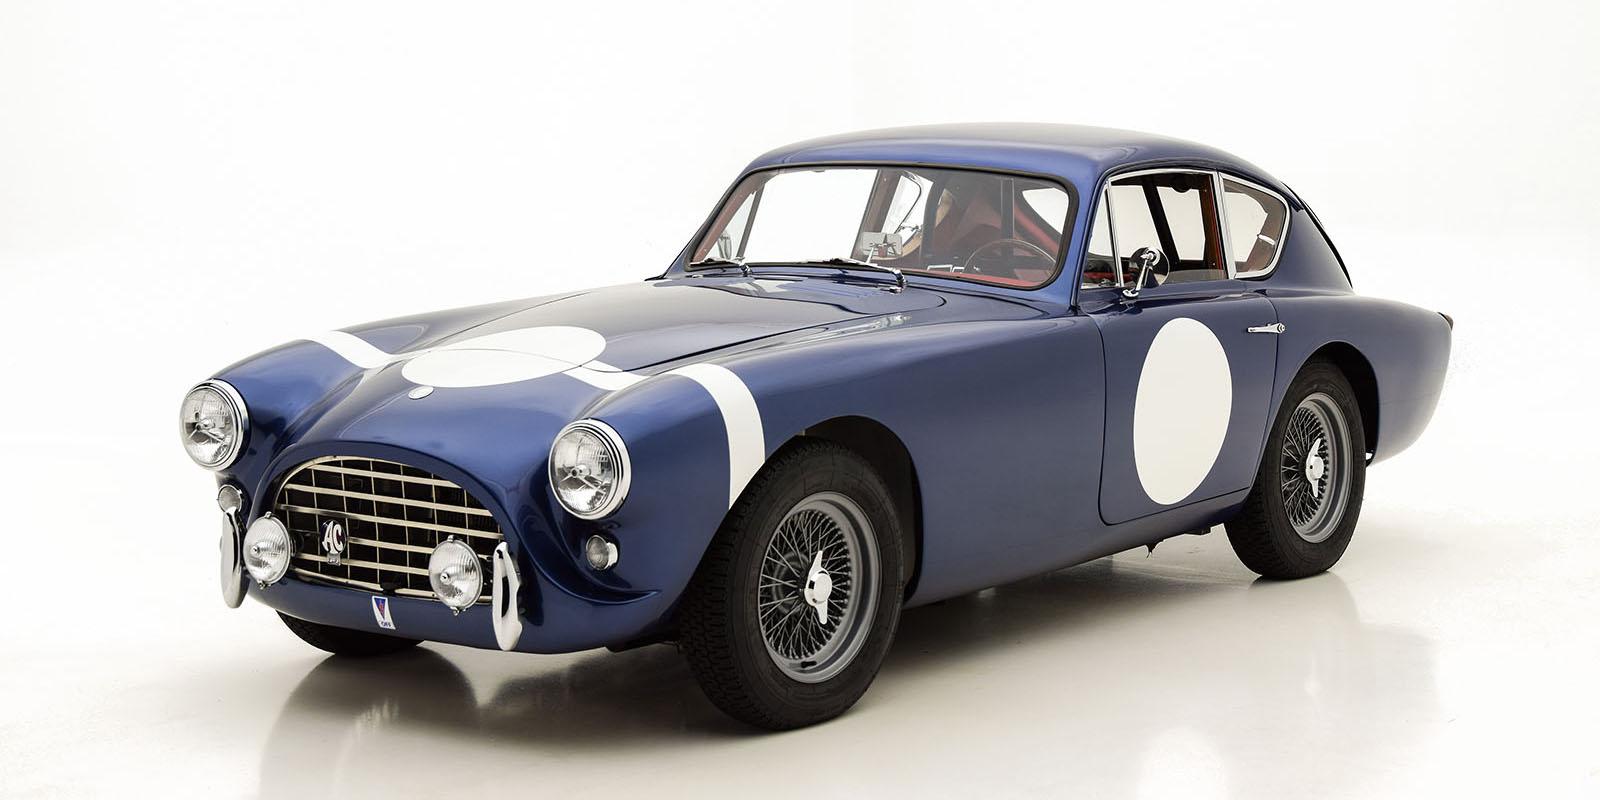 Classic Cars | Buy and Sell Classic Vehicles | Hyman LTD